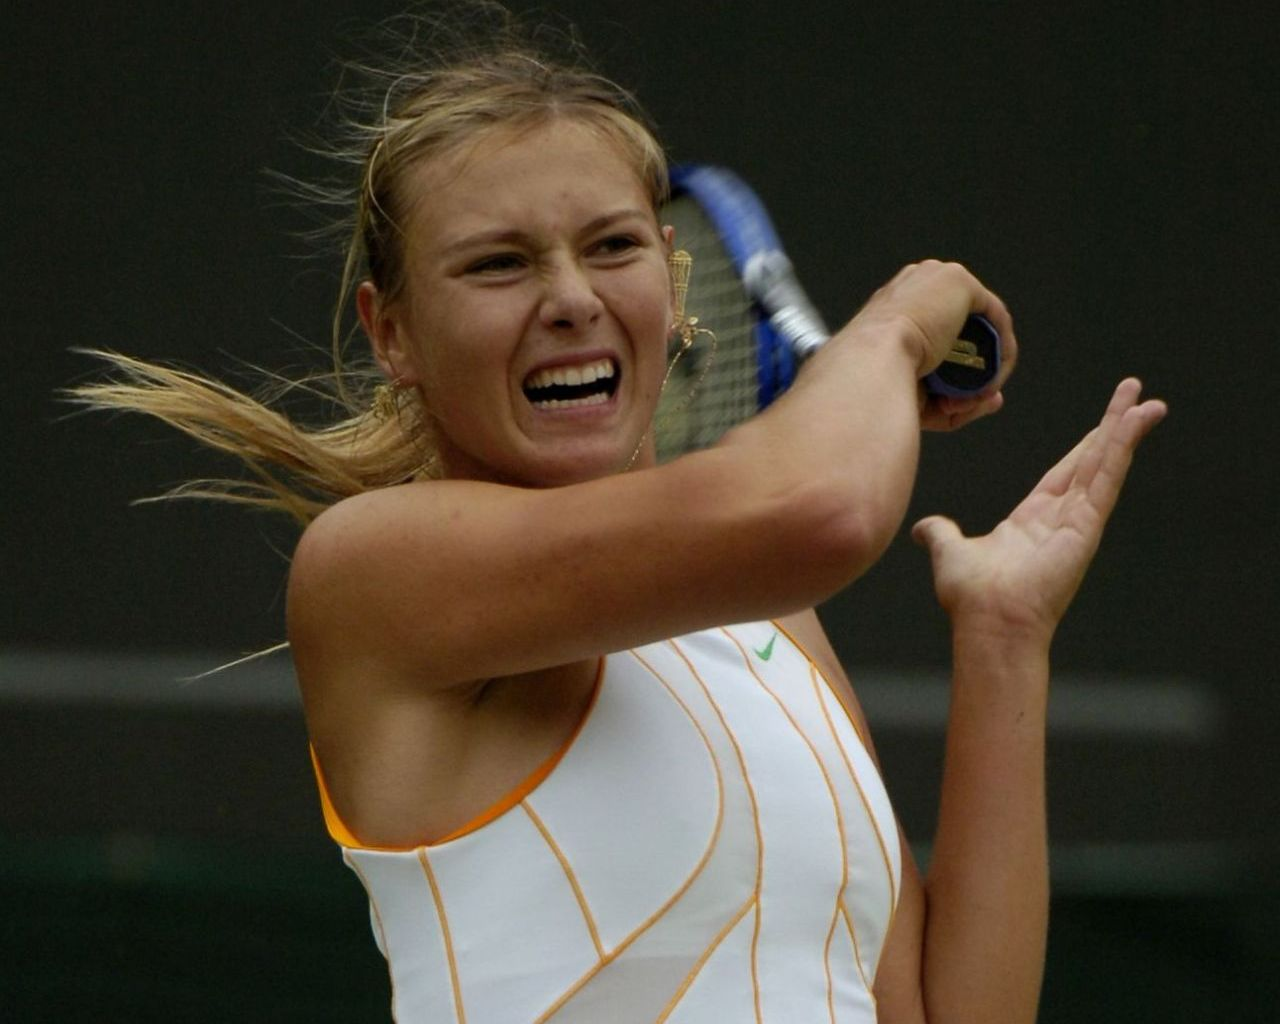 Maria Sharapova 6 Free Wallpaper